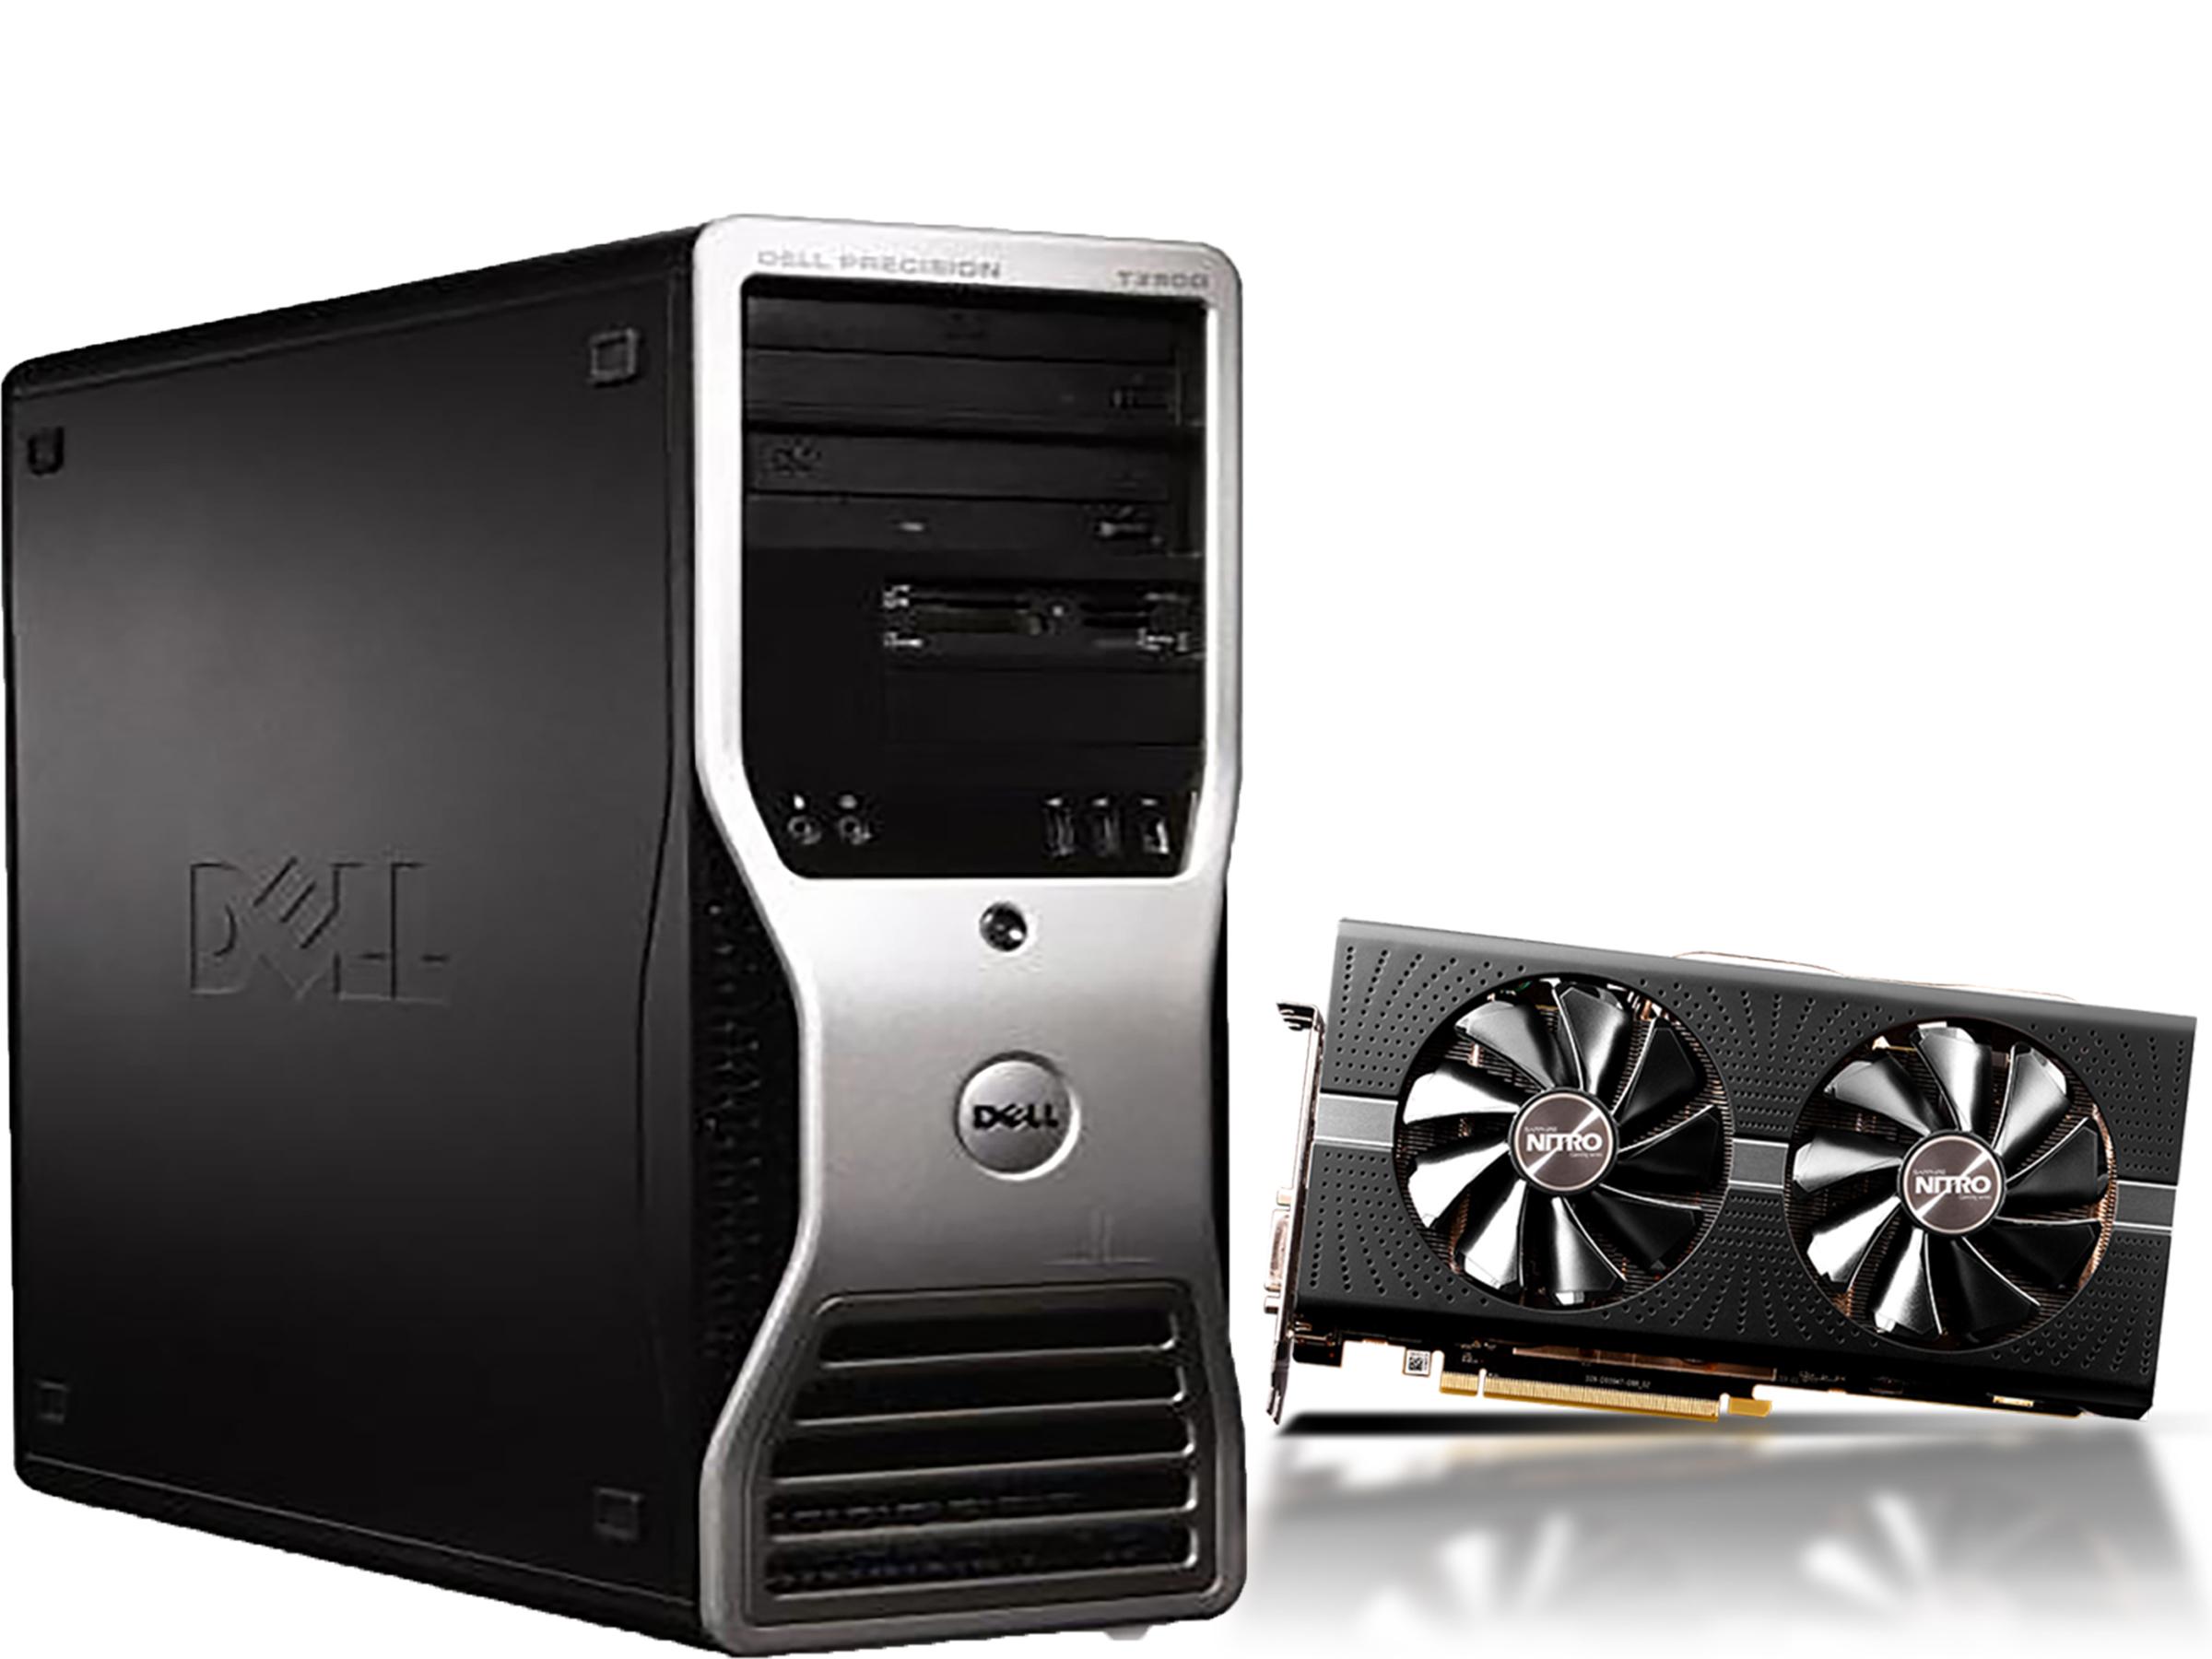 DELL T3500 - معالج Xeon W5590 - كارت RX 580 4GB Sapphire Nitro